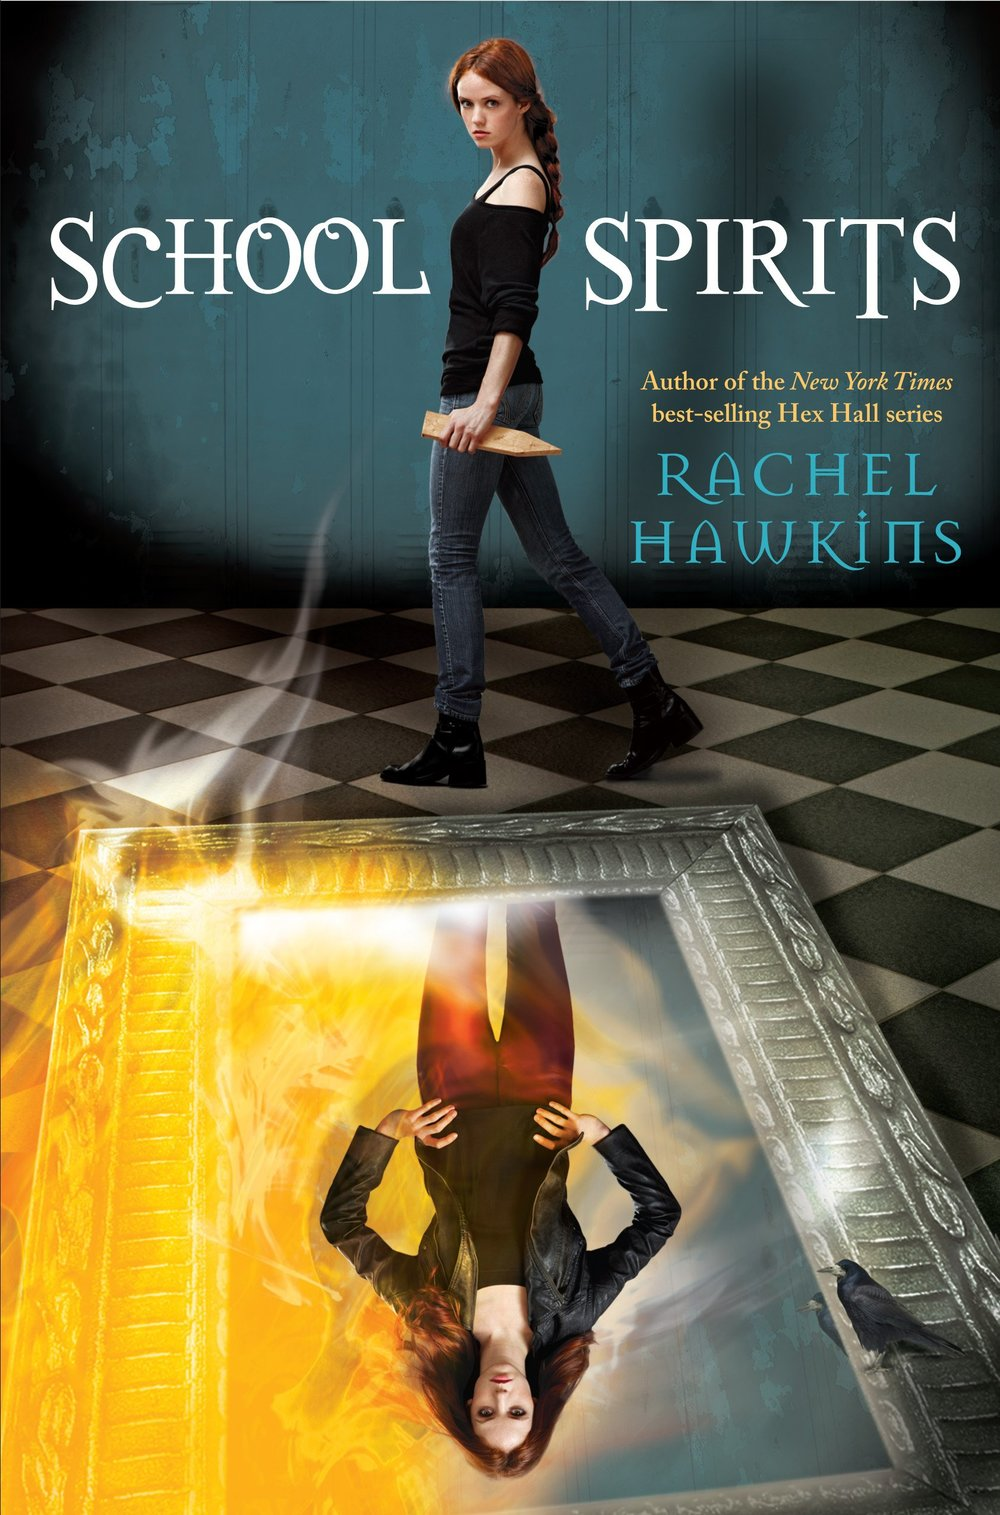 rachel-hawkins-school-spirits.jpg